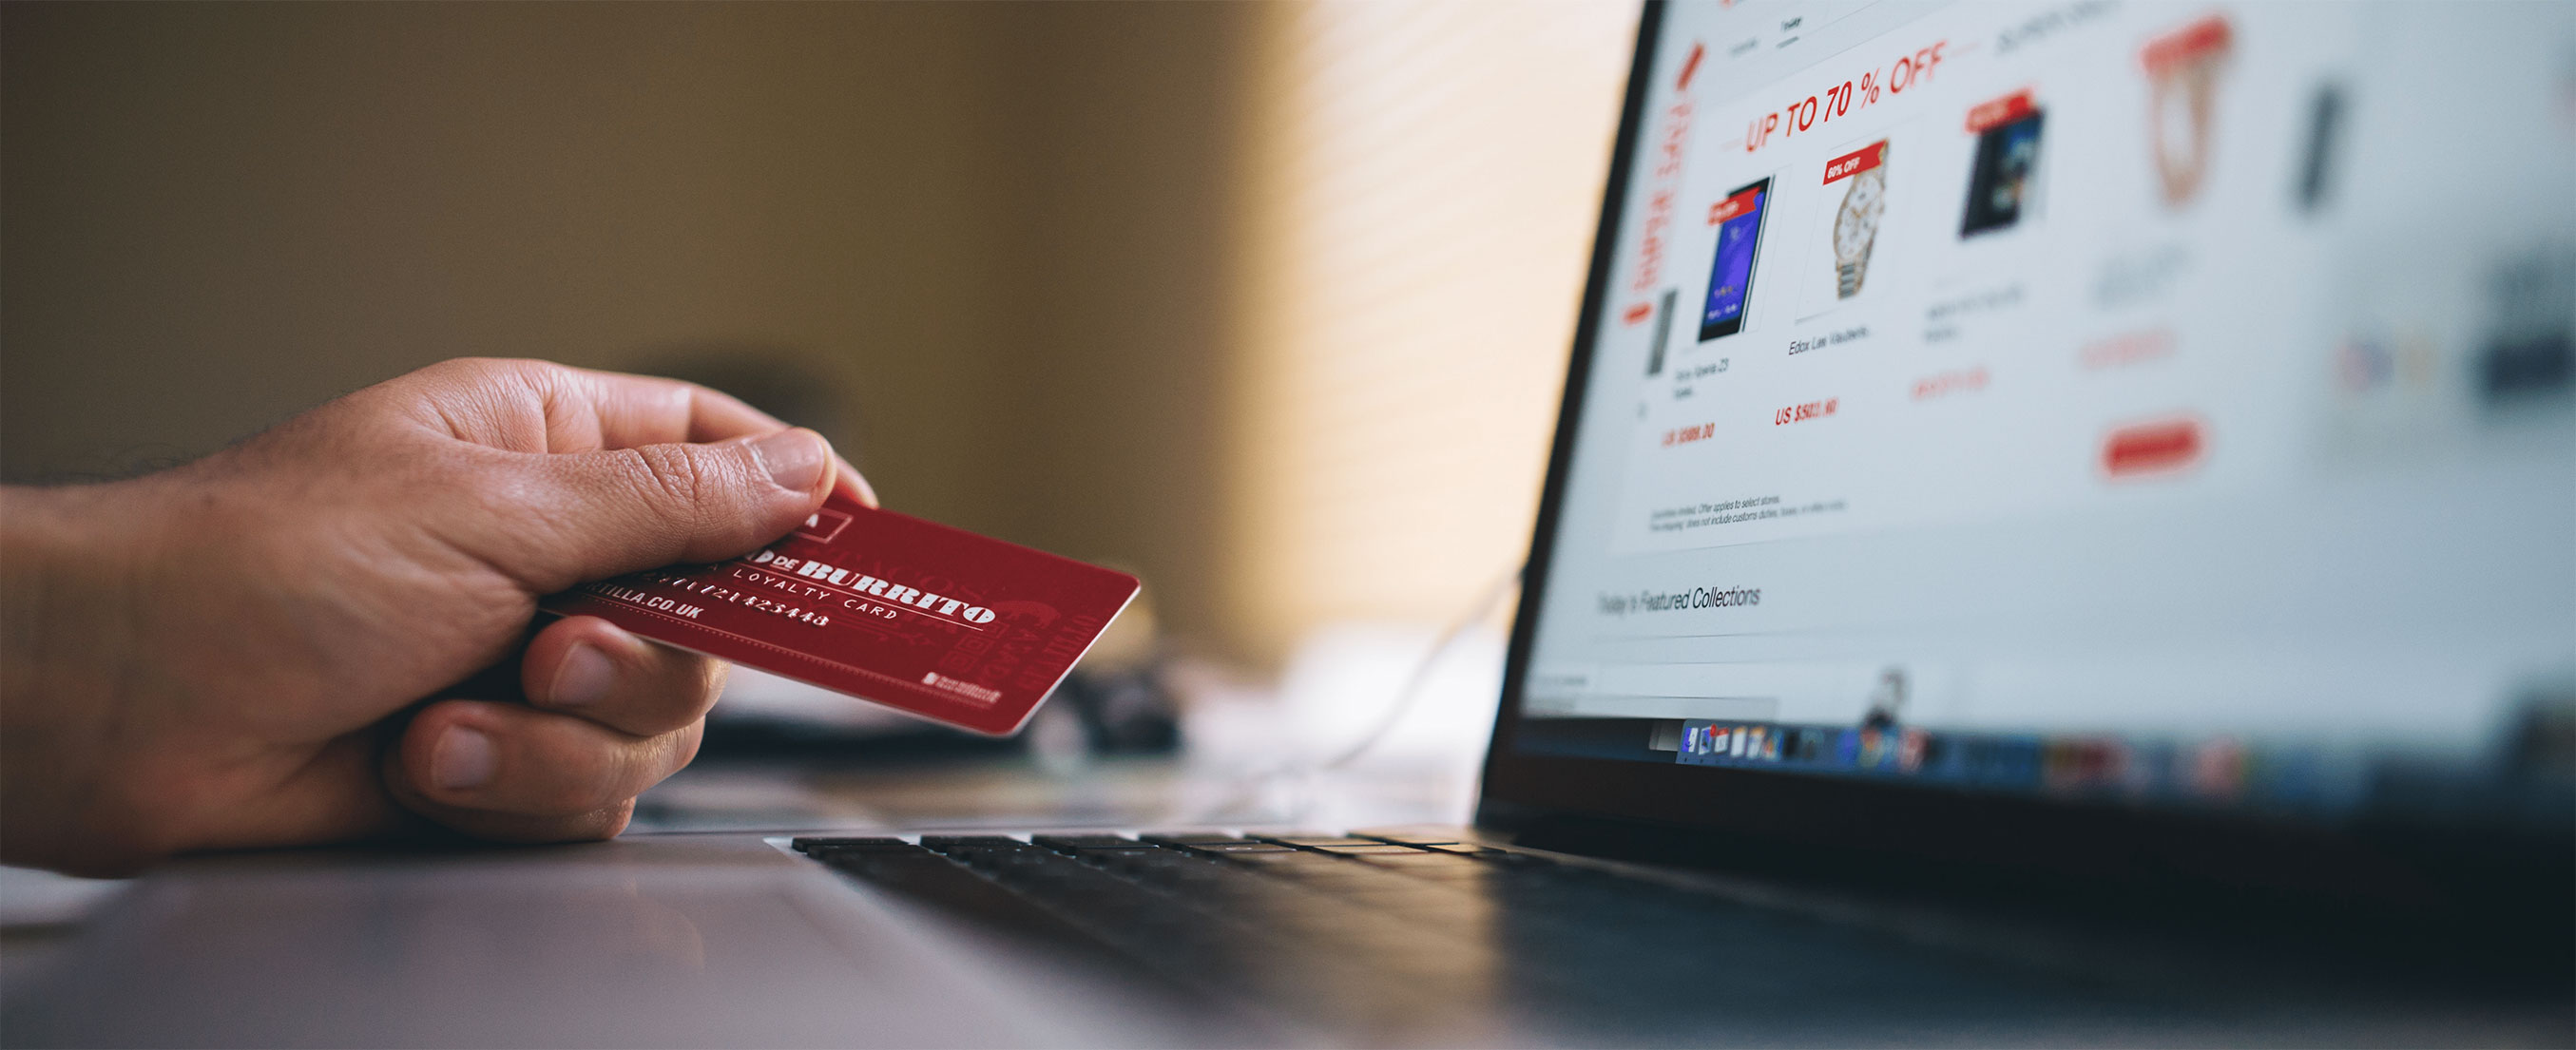 consumer make online purchase on laptop